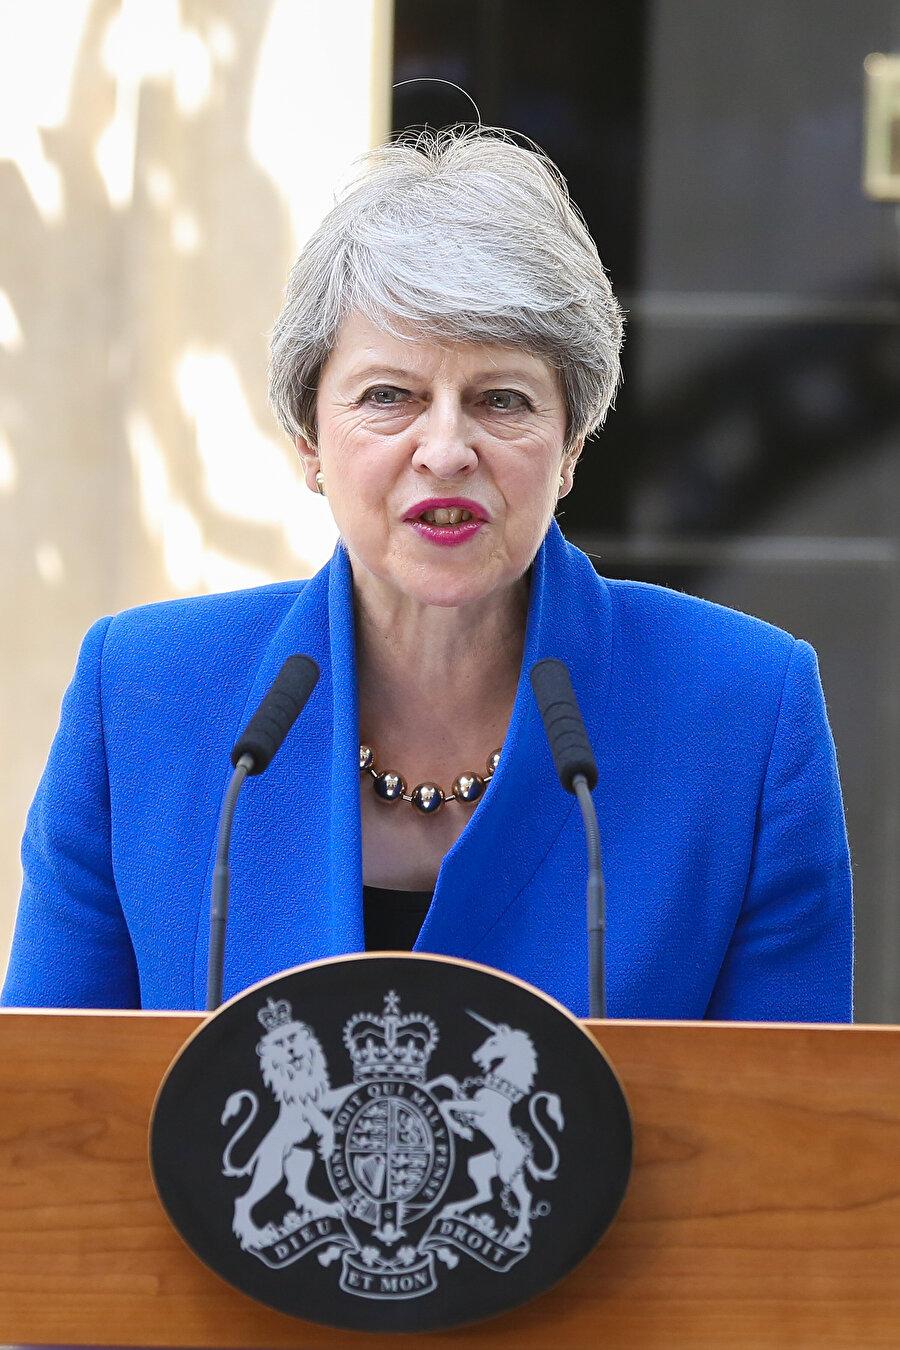 Theresa May, Brexit sürecinde istifa eden ikinci başbakan olmuştu.